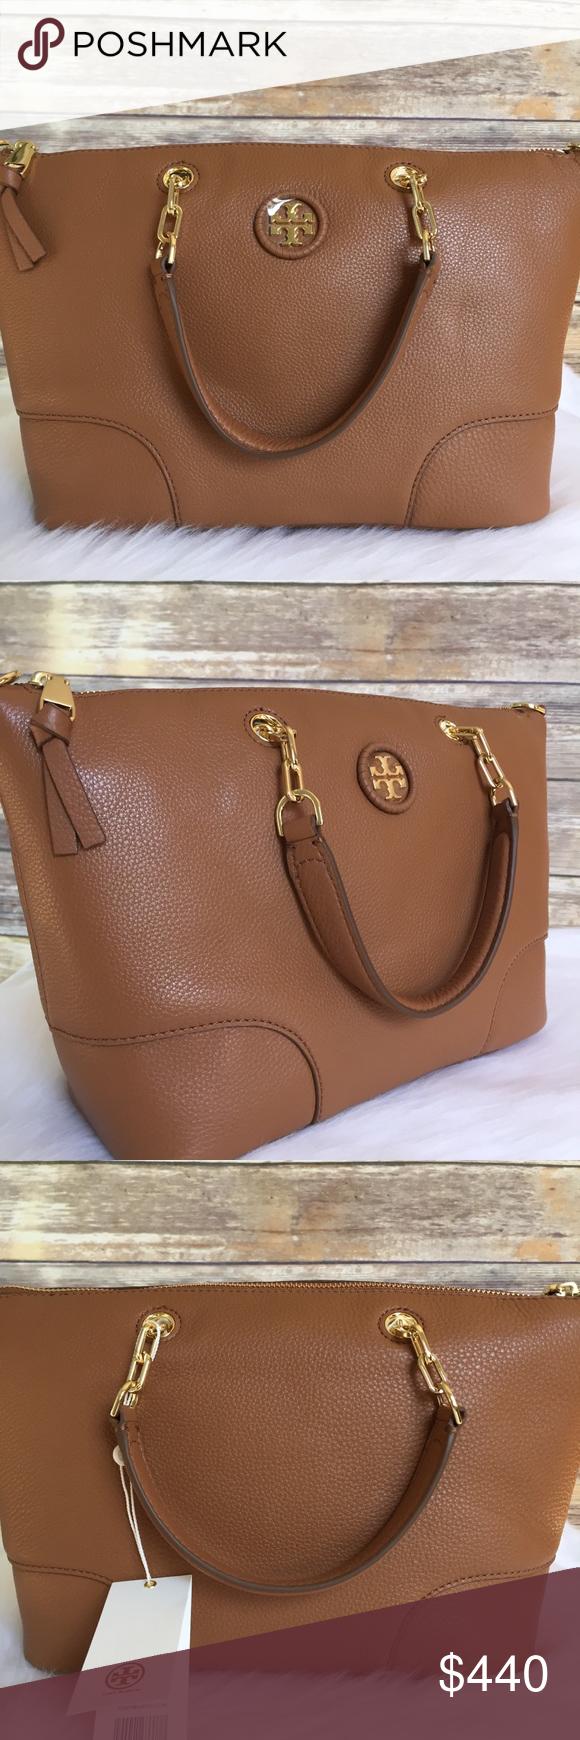 e917df045e1e Crossbody Bag · Tory Burch whipstitch logo small slouchy satchel New with  tag Color  bark brown Tory Burch